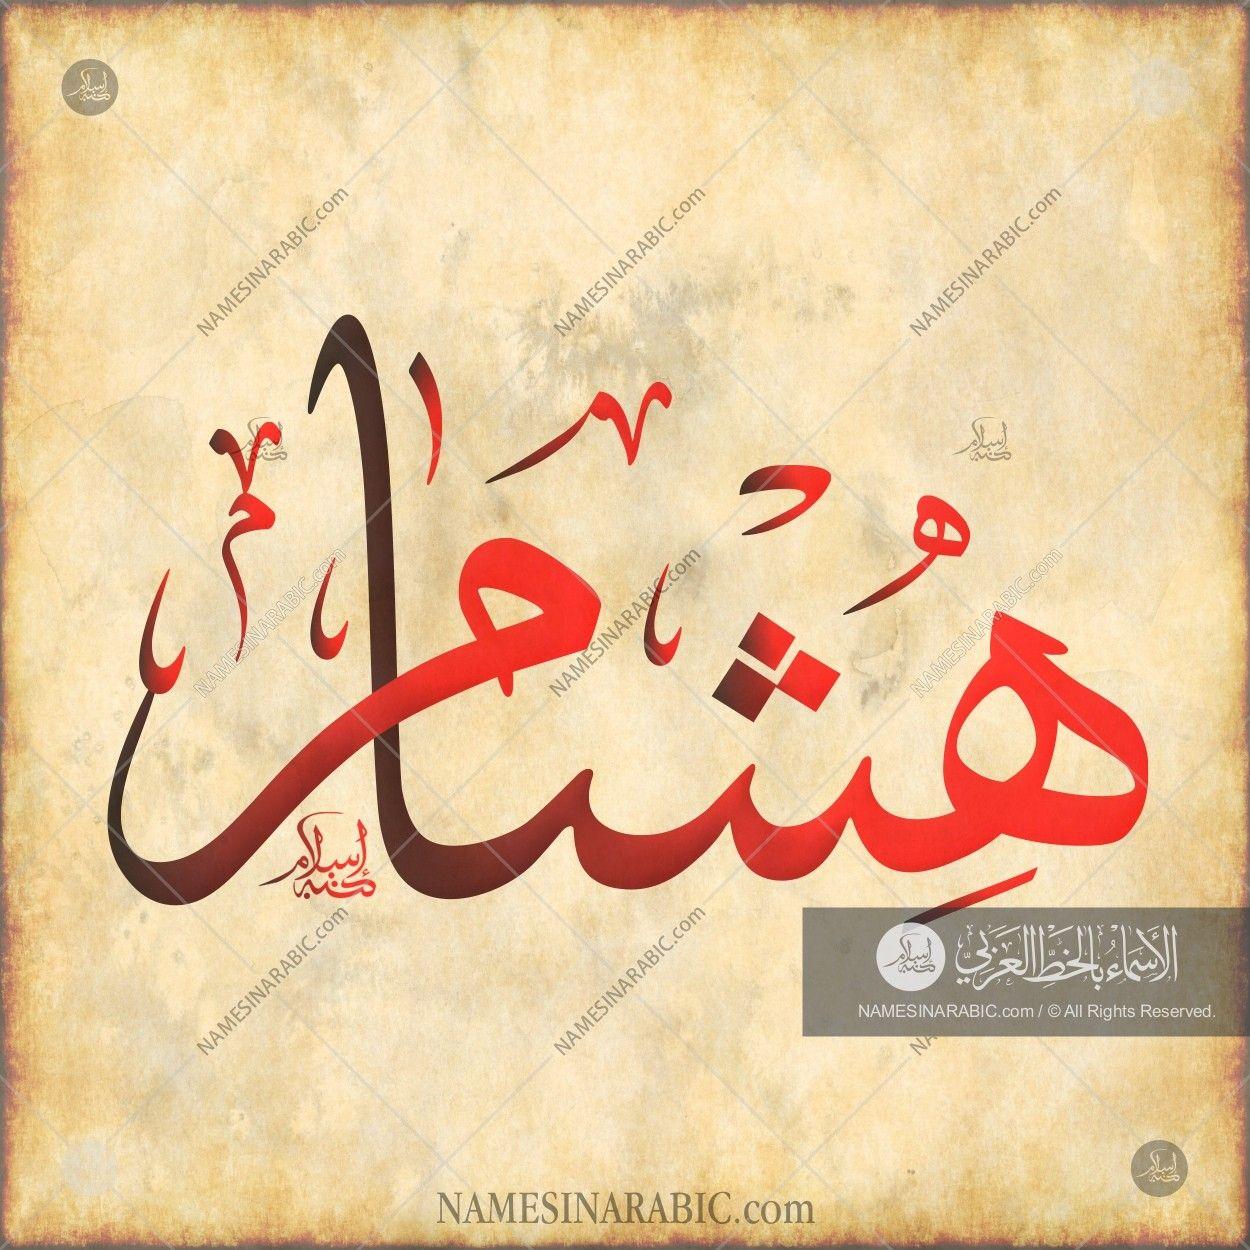 Hisham هشام Names In Arabic Calligraphy Name 1707 Arabic Calligraphy Design Calligraphy Name Arabic Calligraphy Art